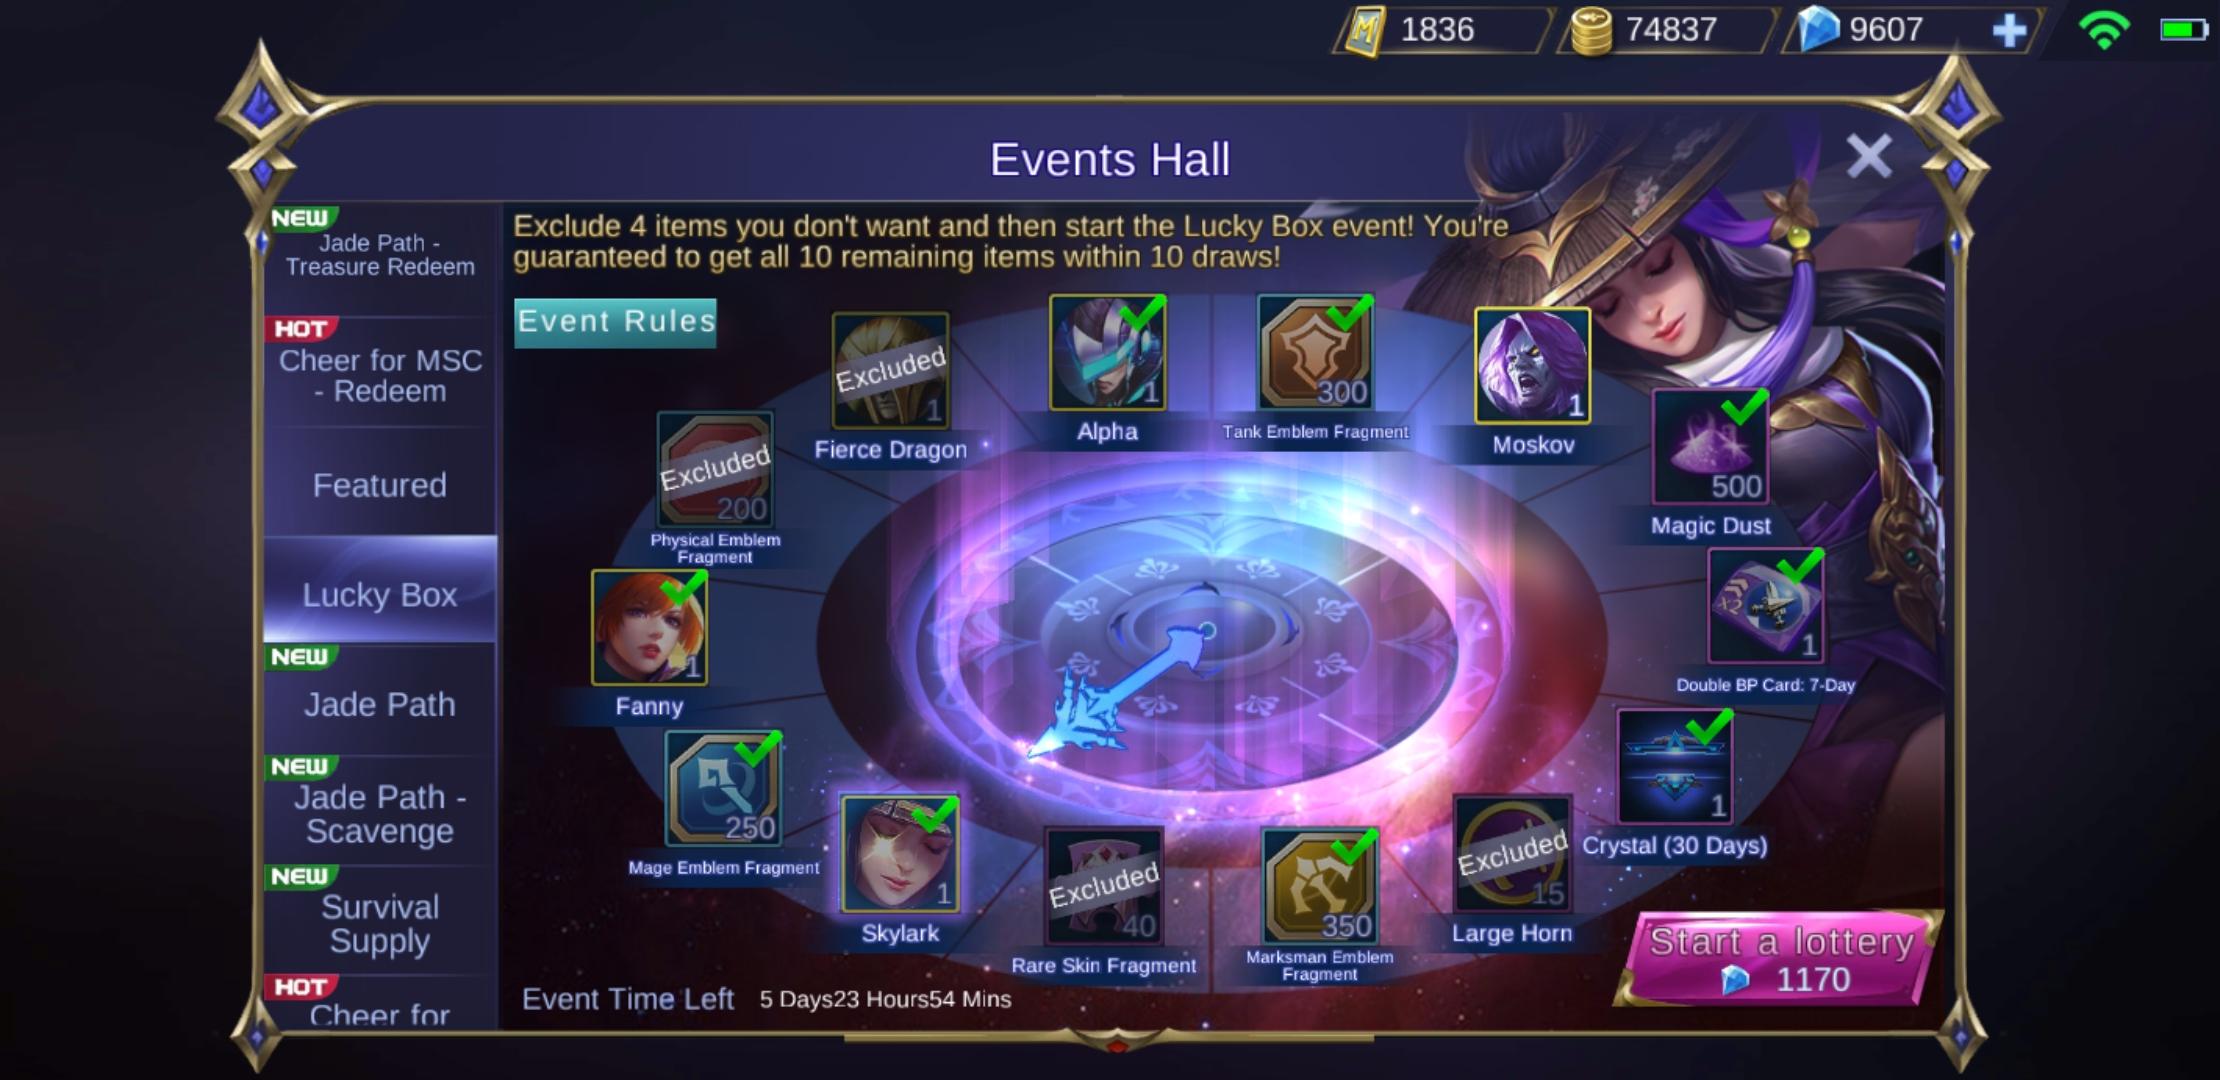 Punya Banyak Diamond Ml Beli Lucky Box Spesial Diskon Atau Event Buku Mobile Legends Esportsku